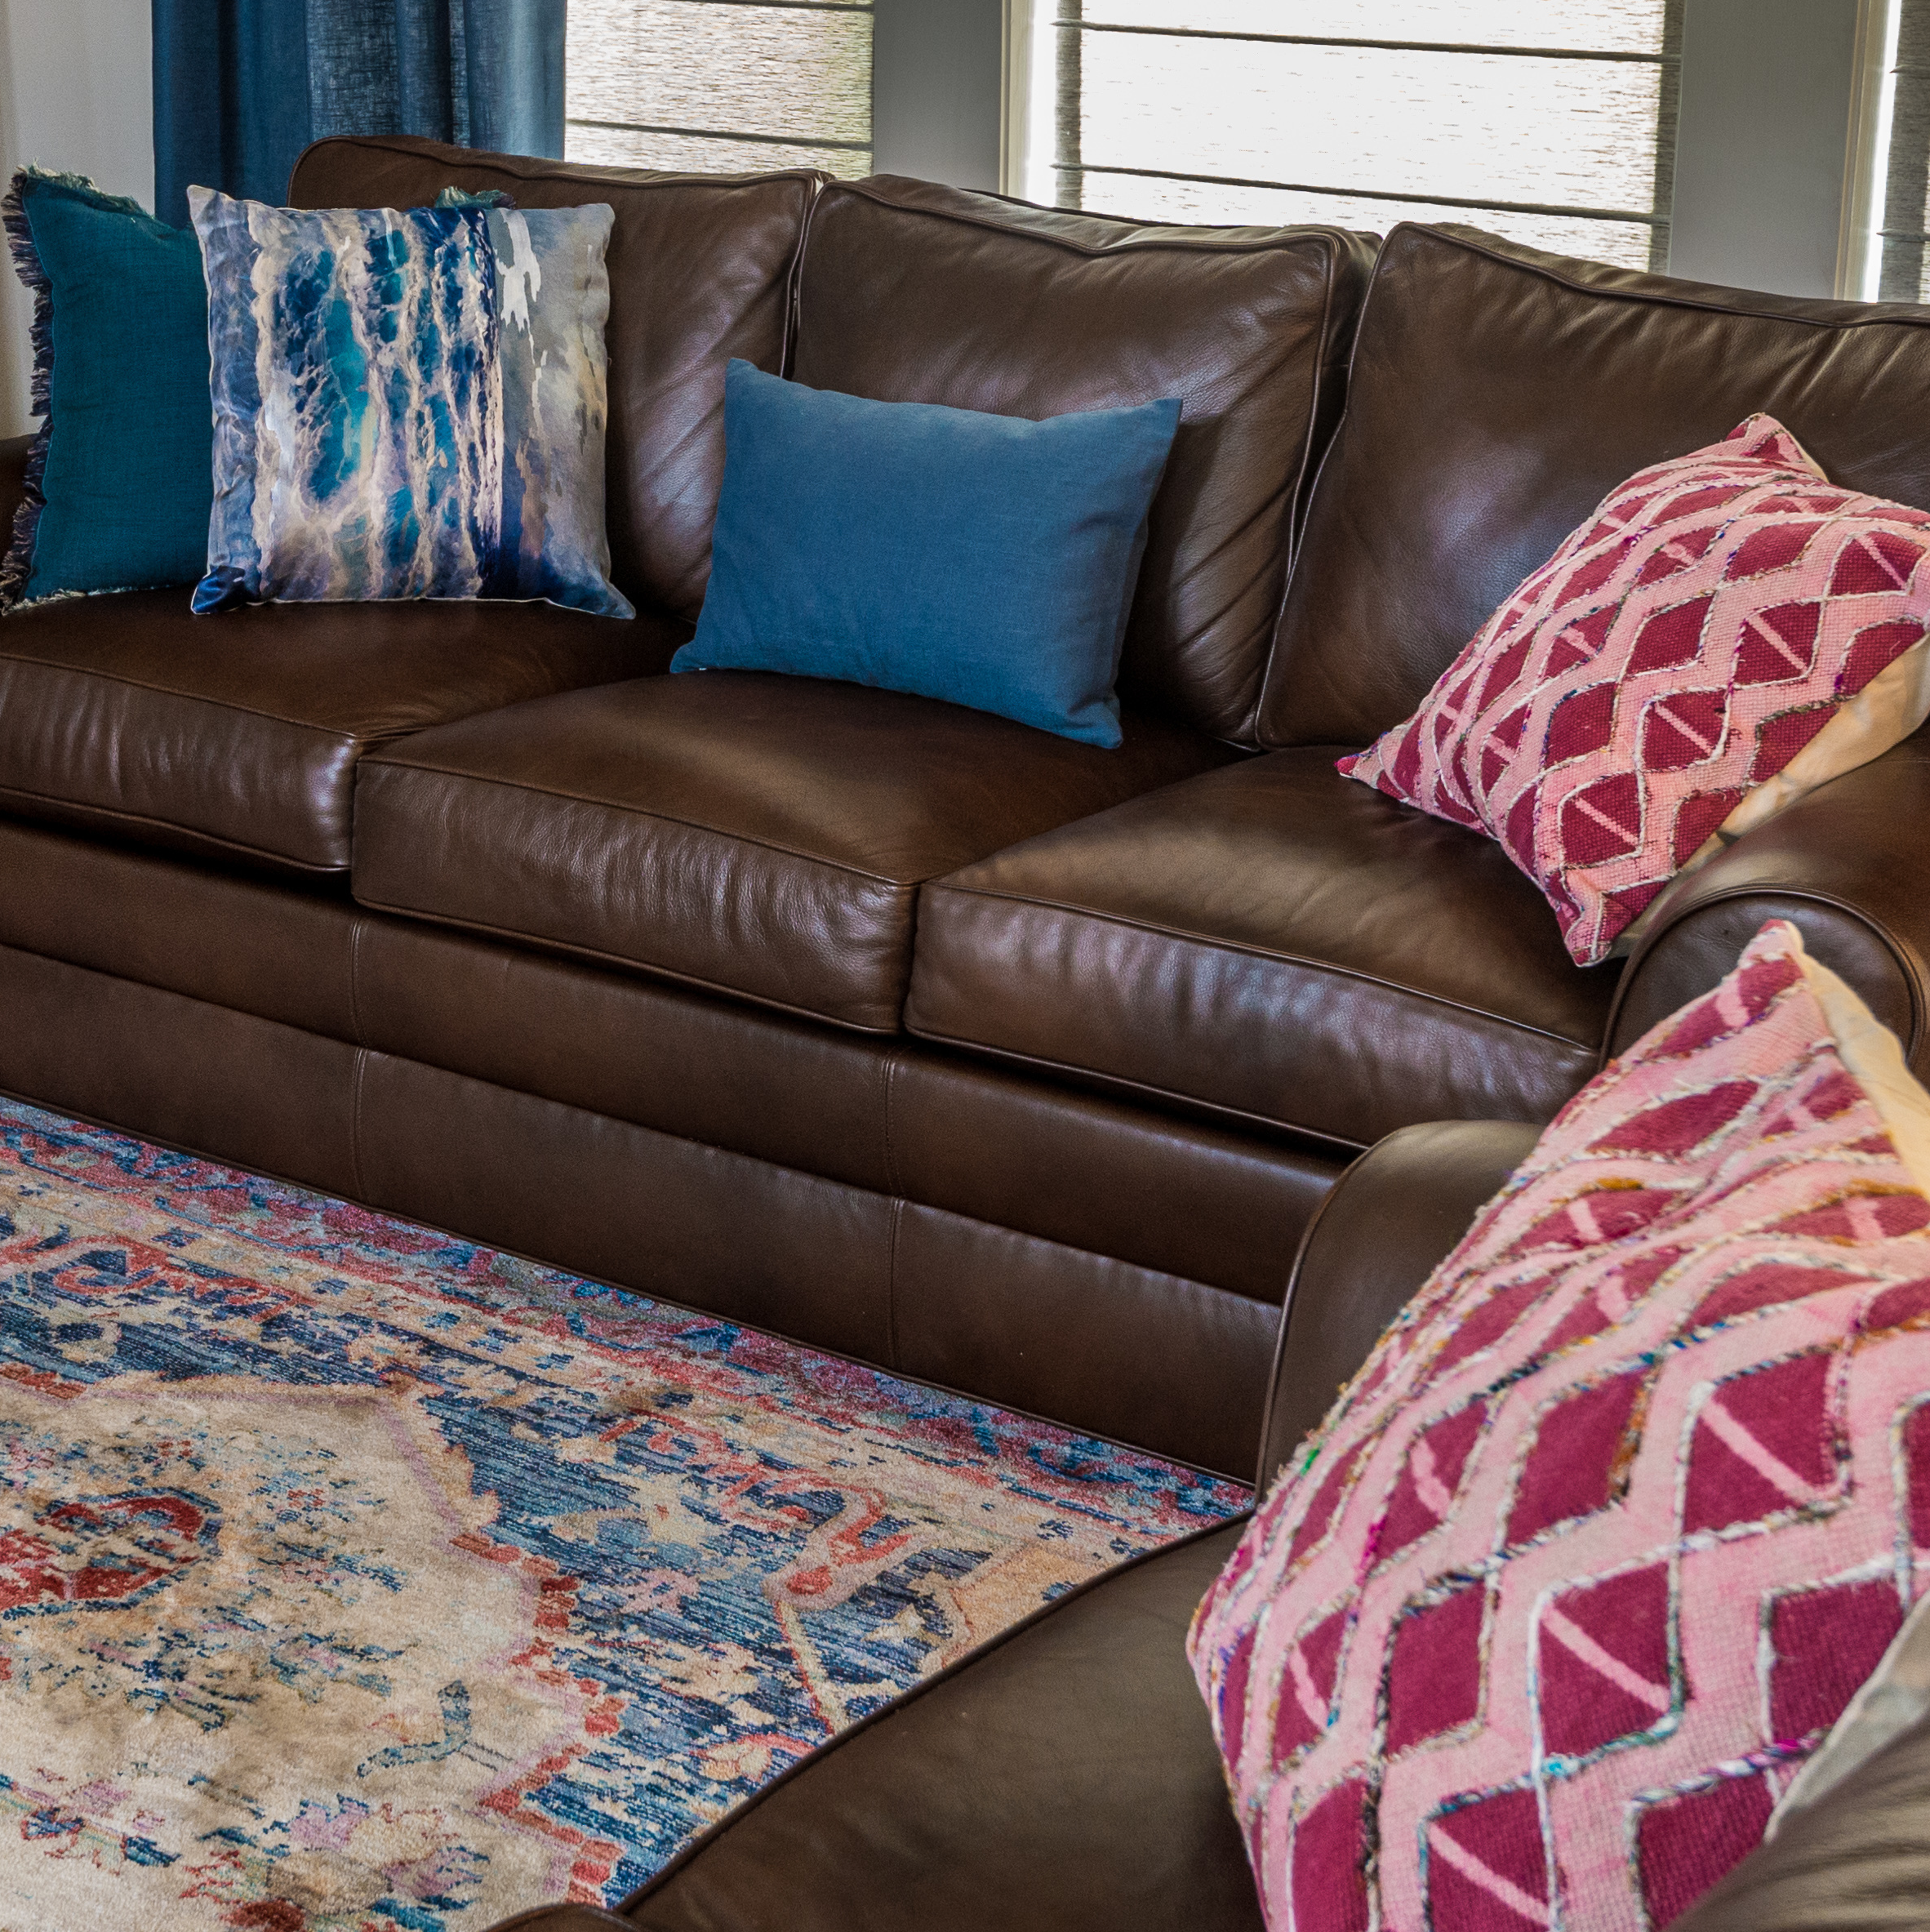 leather sofa pillows metairie luxury interior design khb interiors